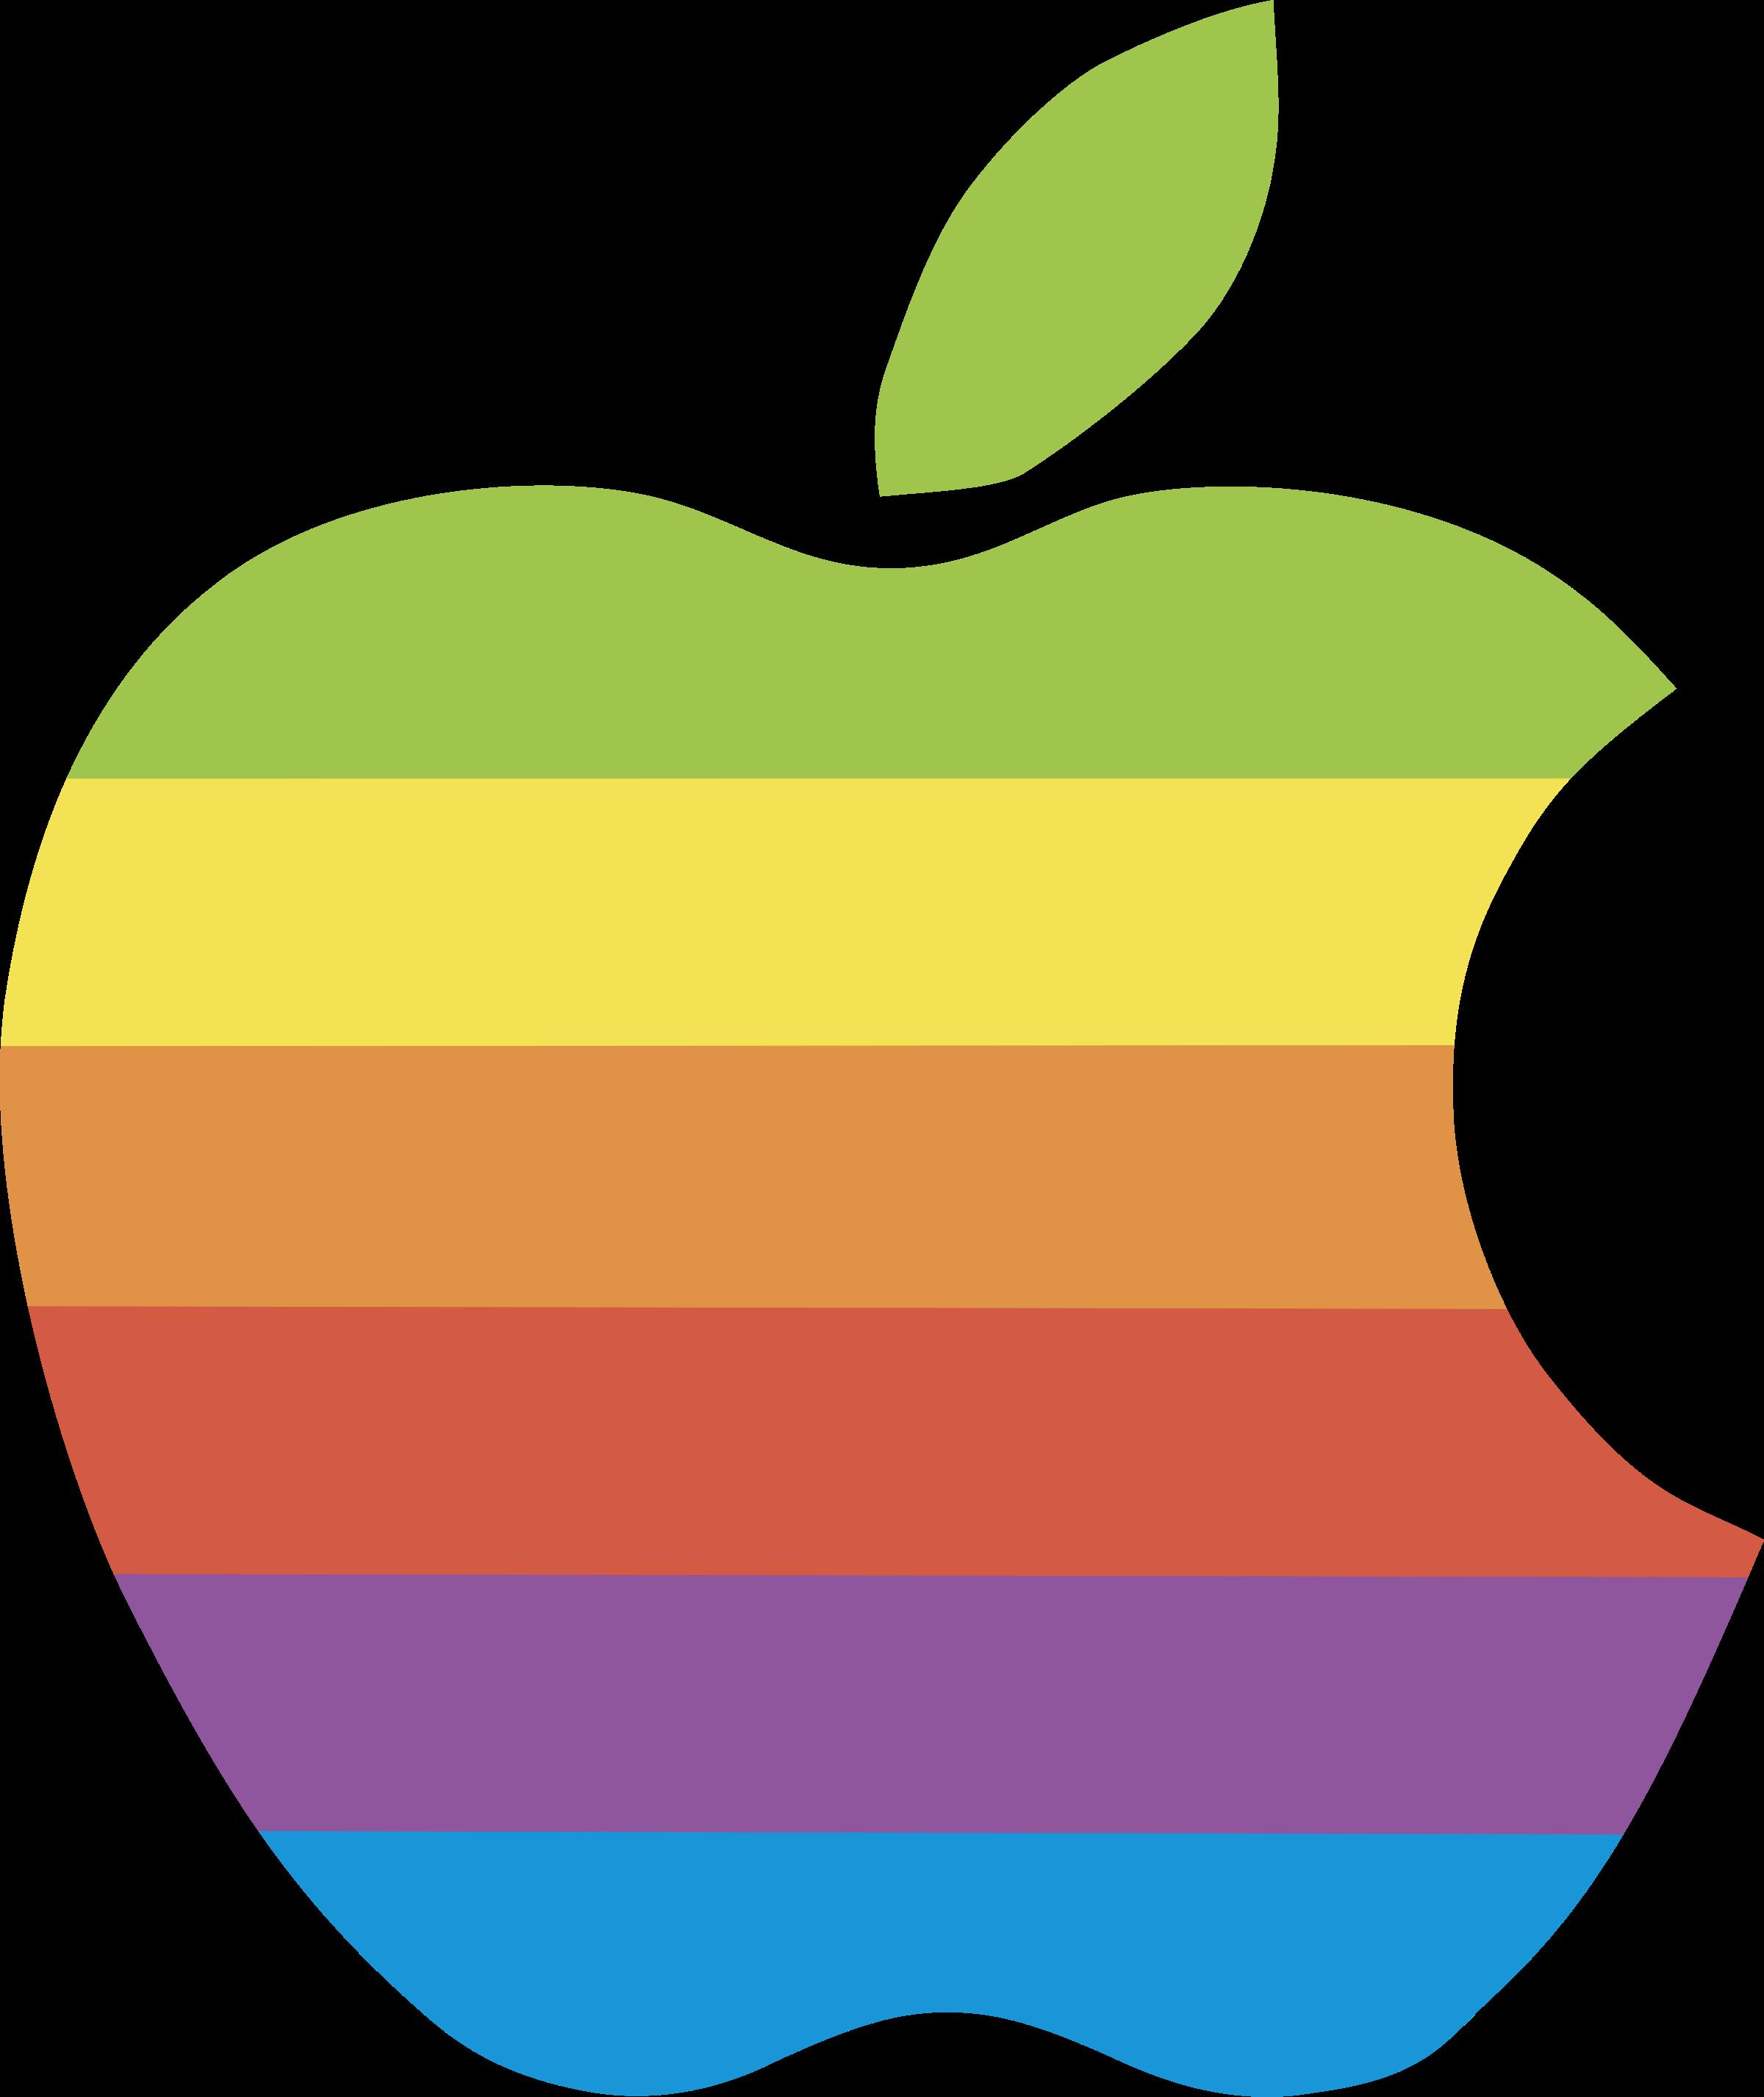 Fajarv: Transparent Background Apple Logo Png Hd